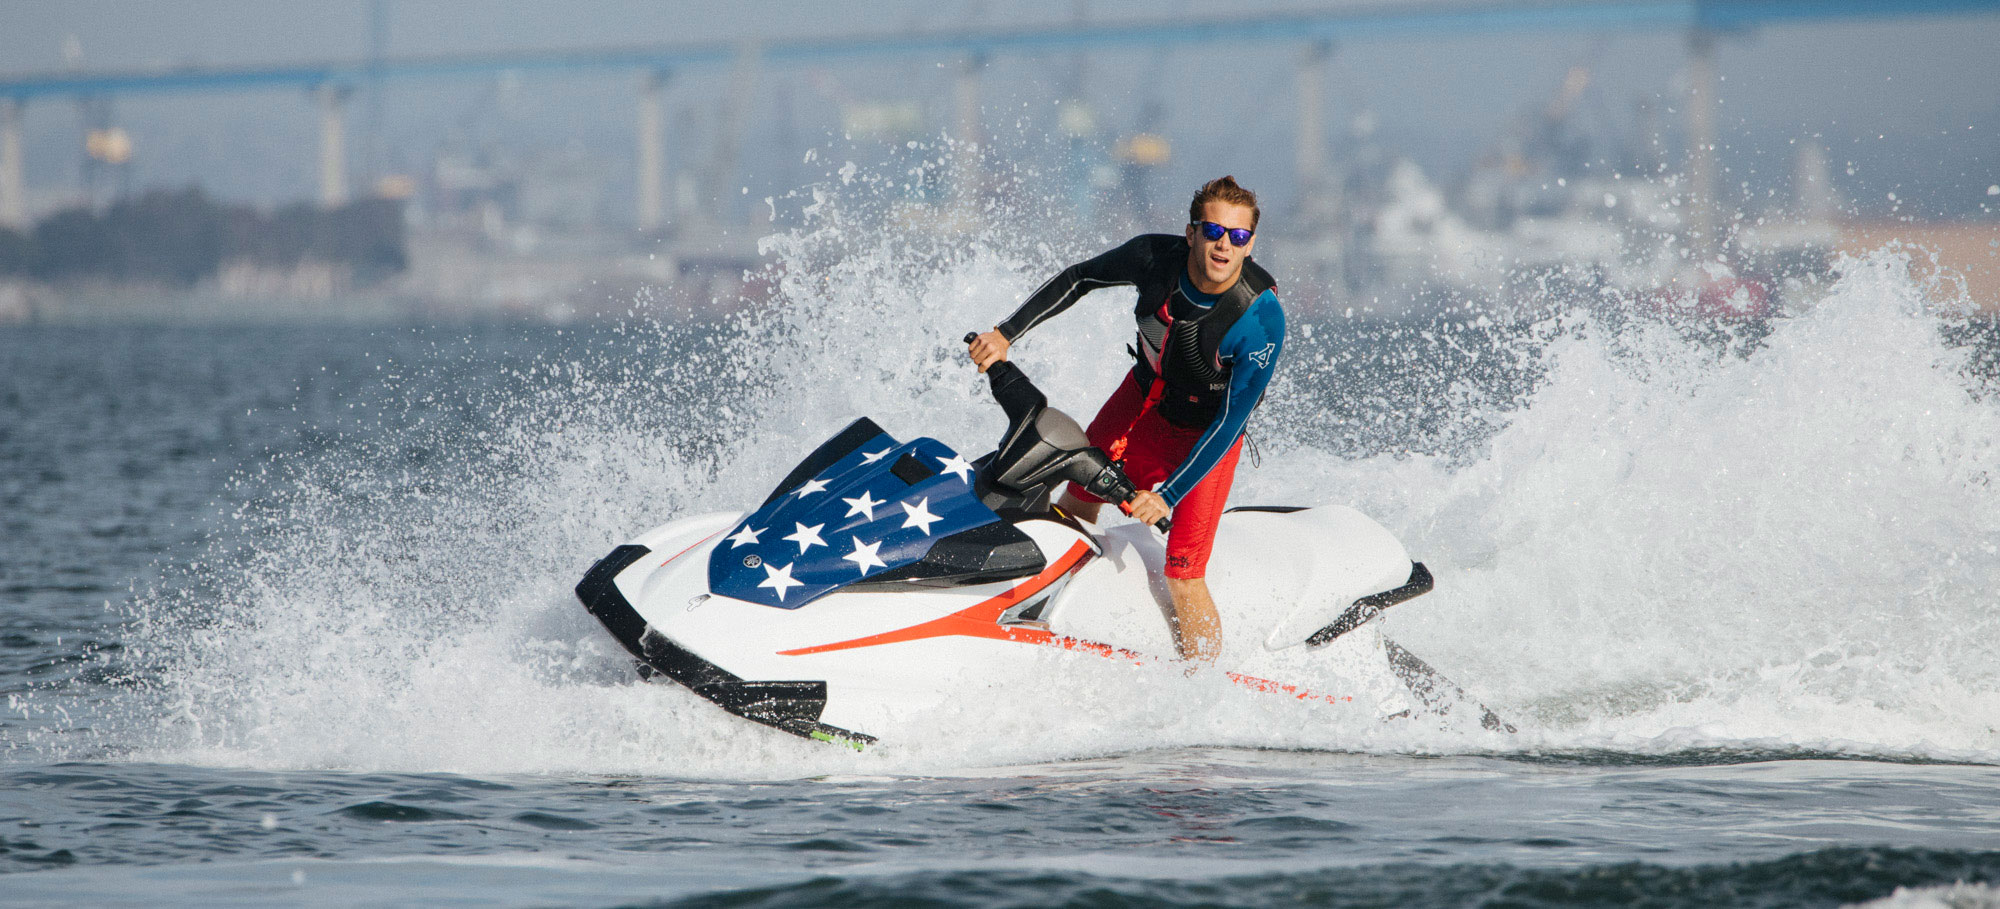 San Diego Jet Ski Rentals